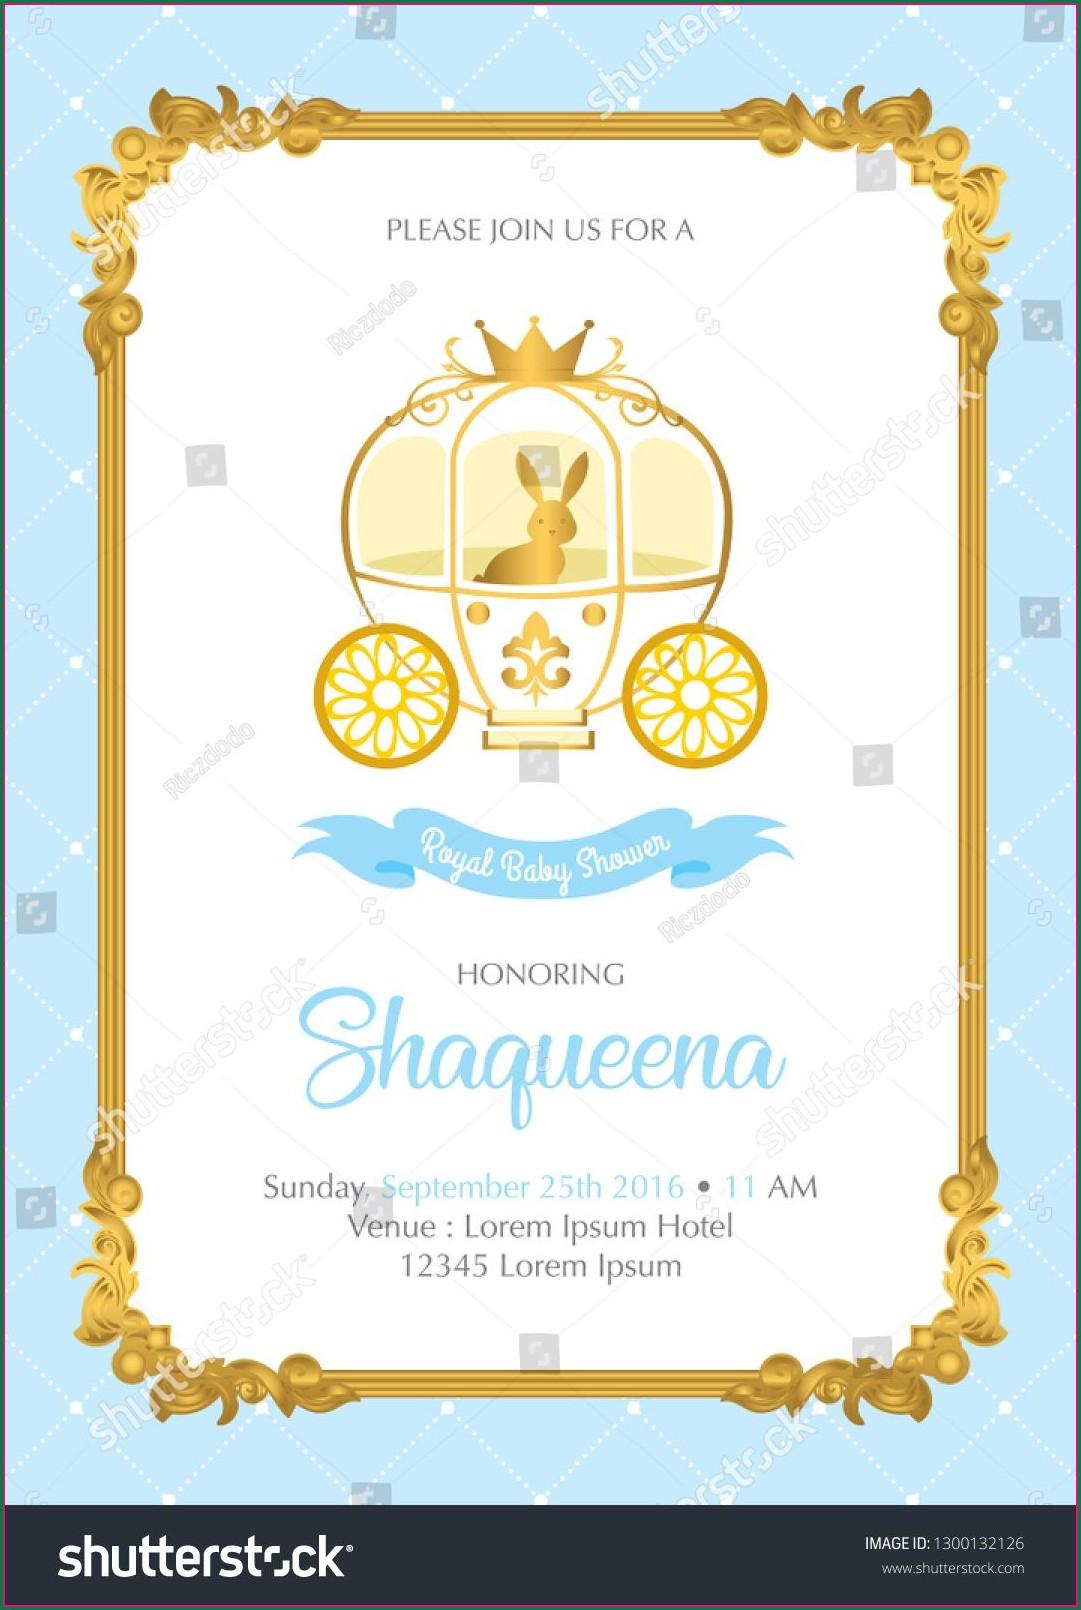 Royal Prince Invitation Card